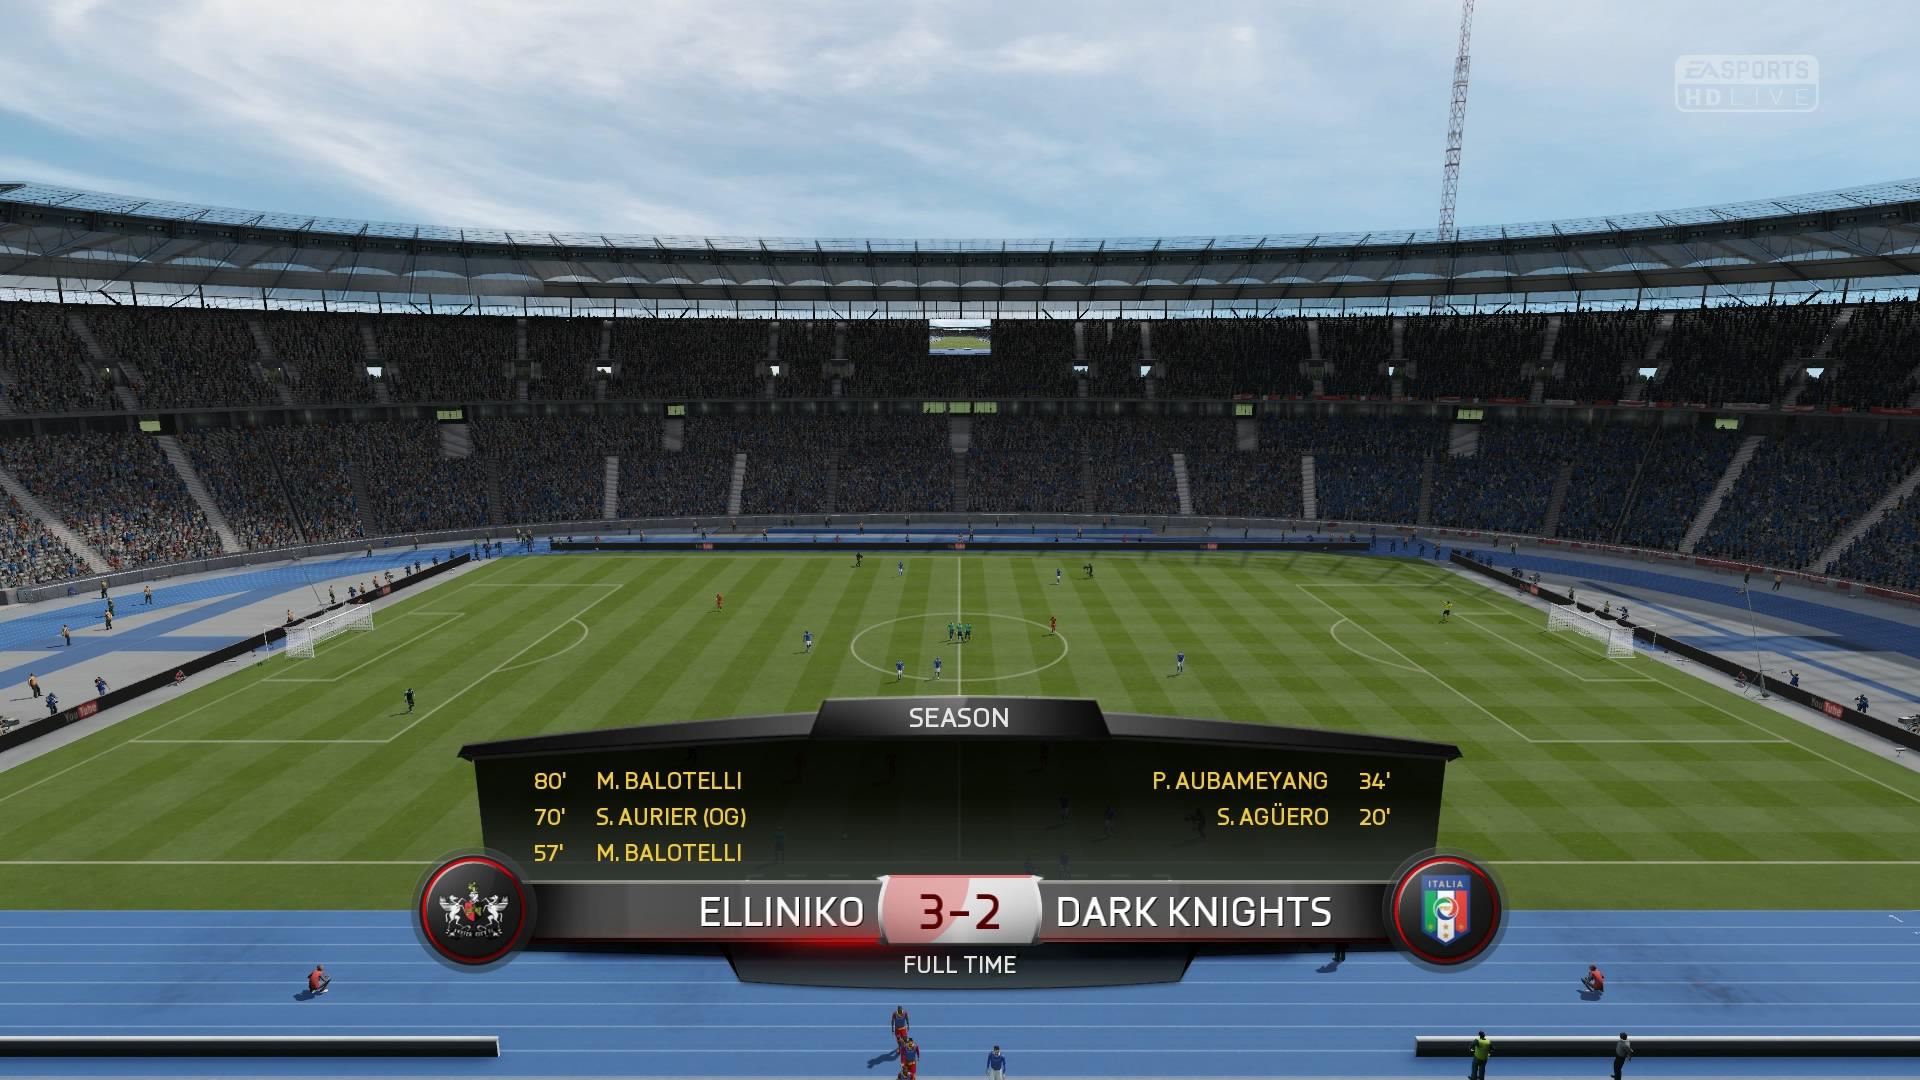 FIFA15FUTSeasons3-2FUTVFUT2ndHalf.jpg